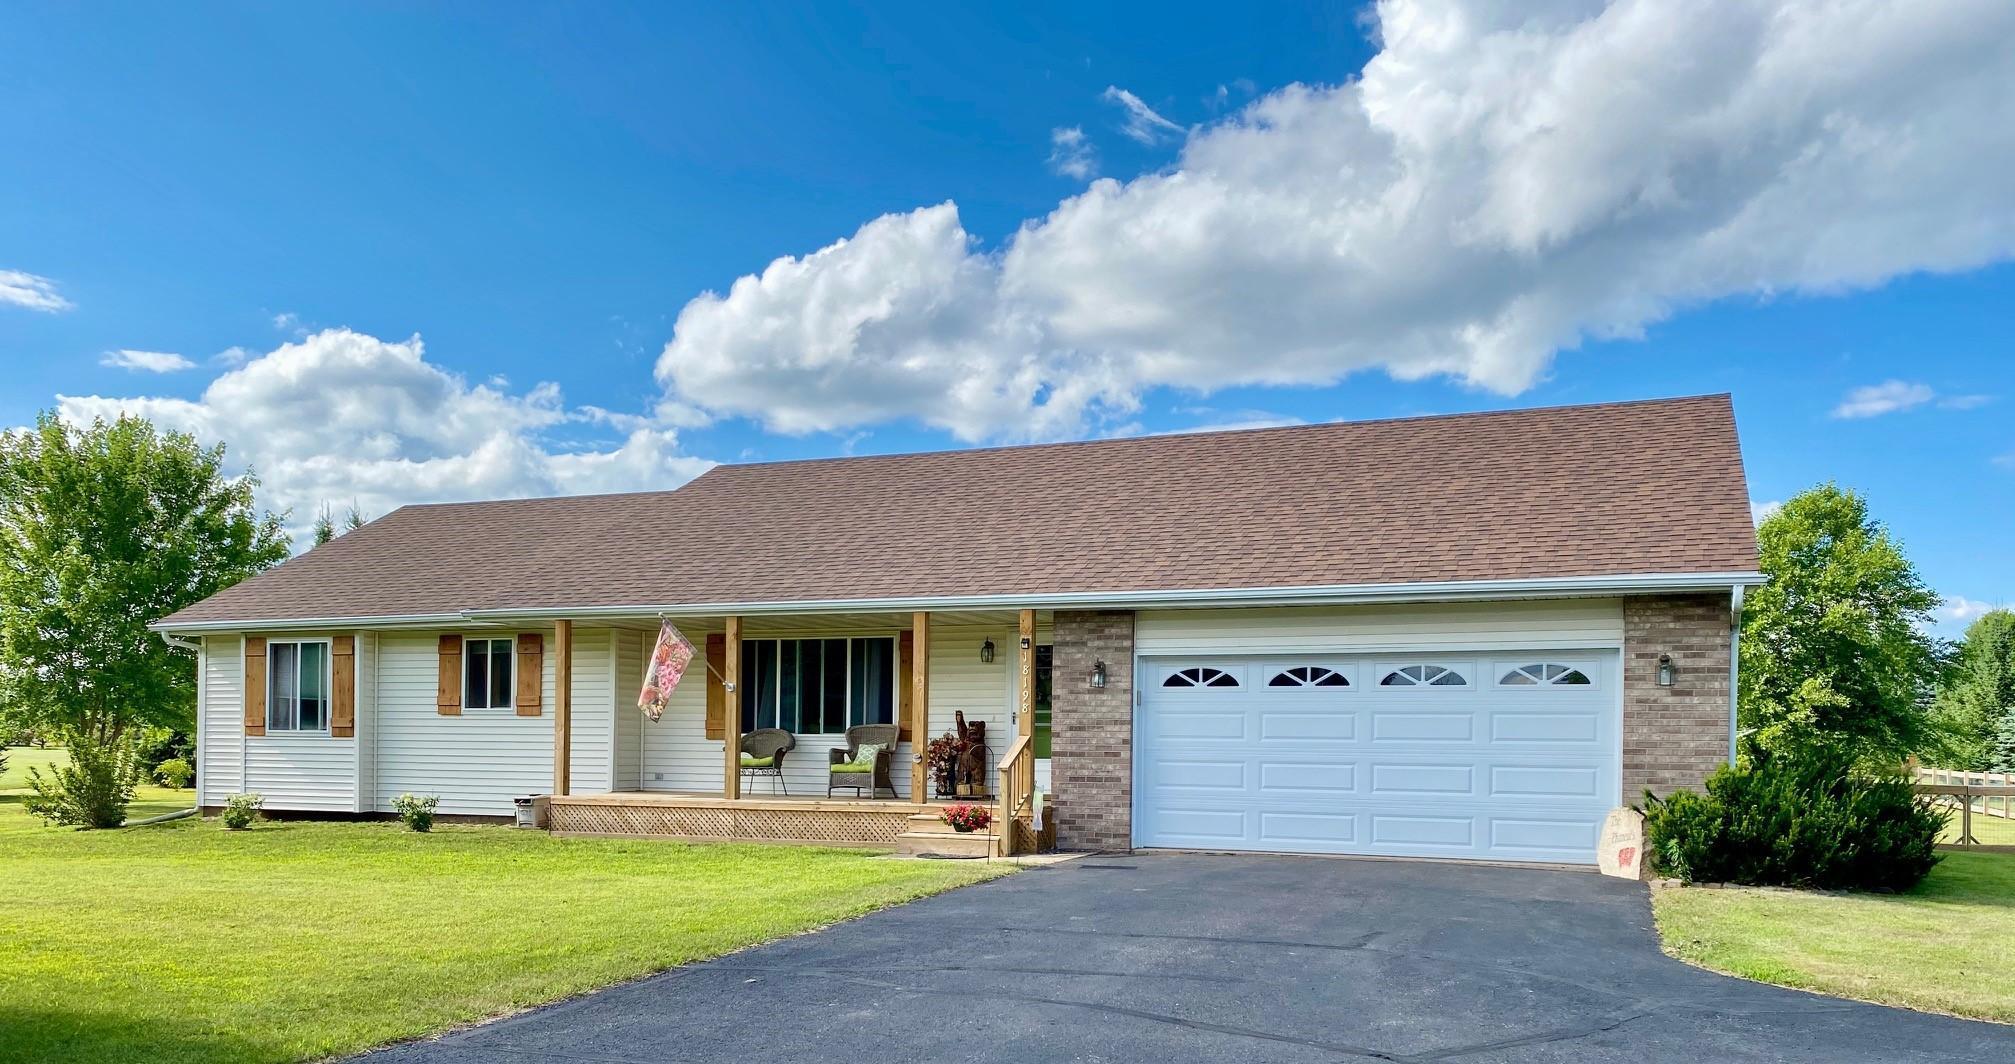 18198 50th Avenue Property Photo - Chippewa Falls, WI real estate listing